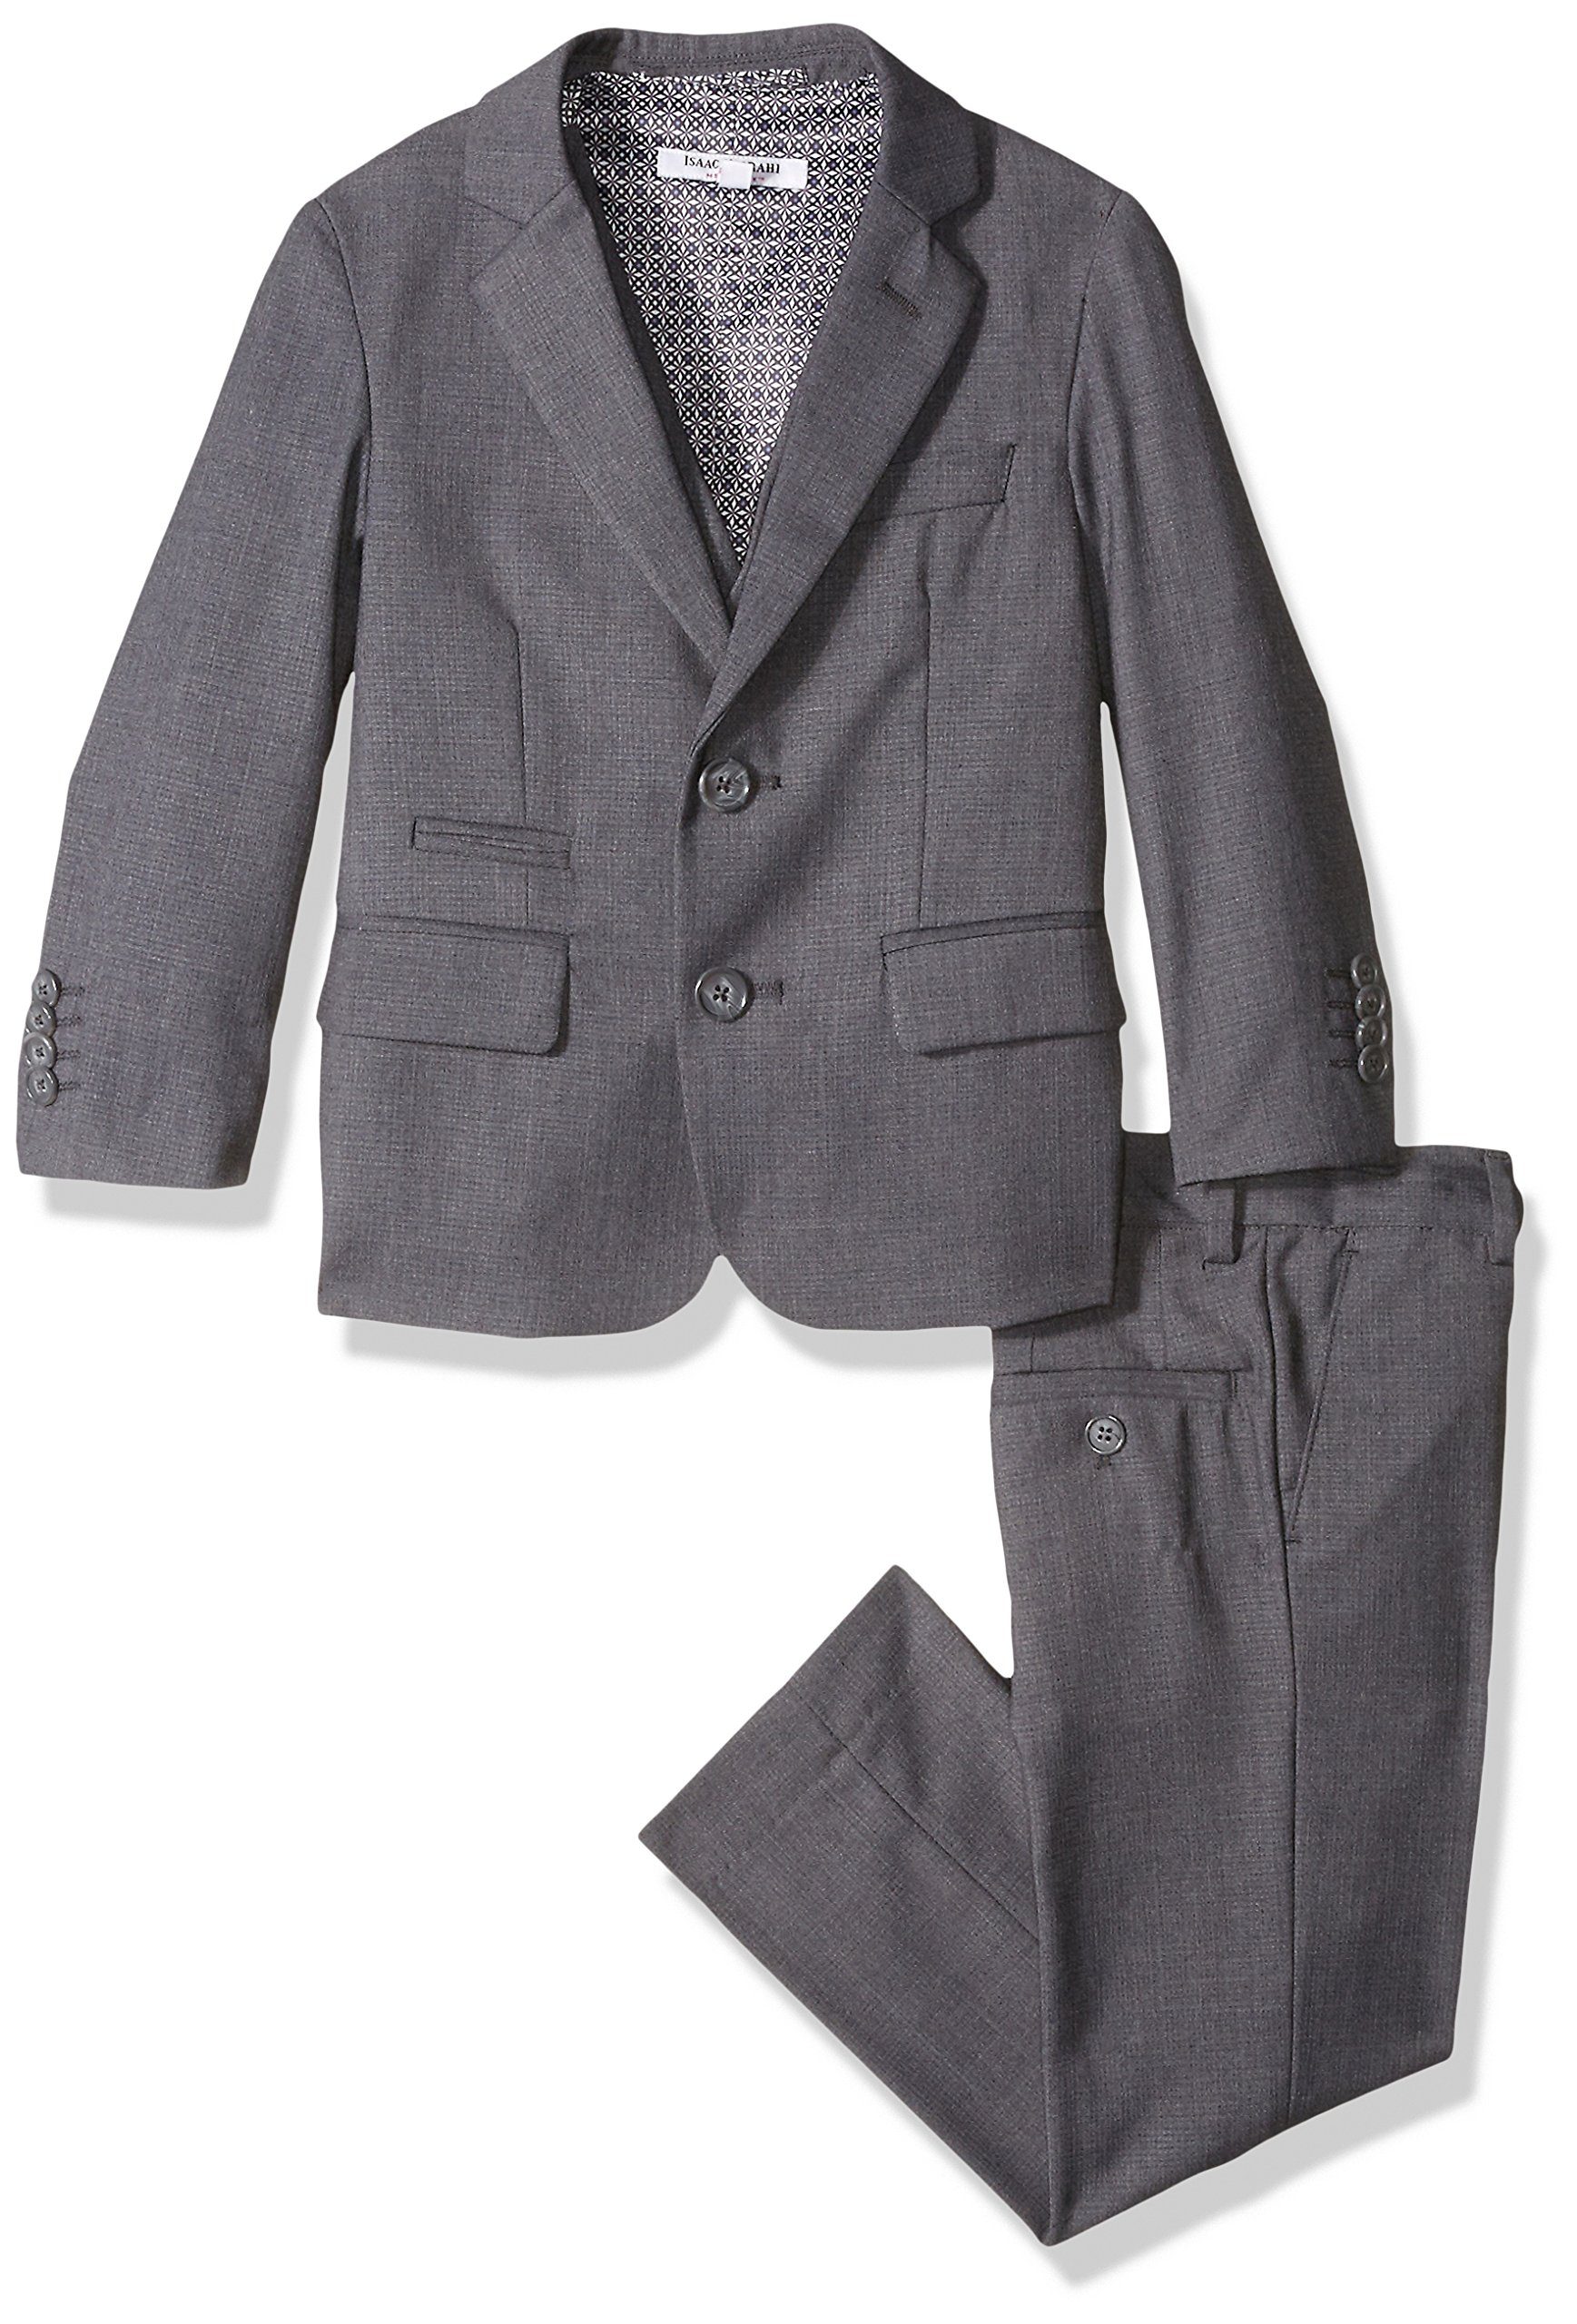 Isaac Mizrahi Big Boys' Textured 3pc Solid Suit, Charcoal, 18